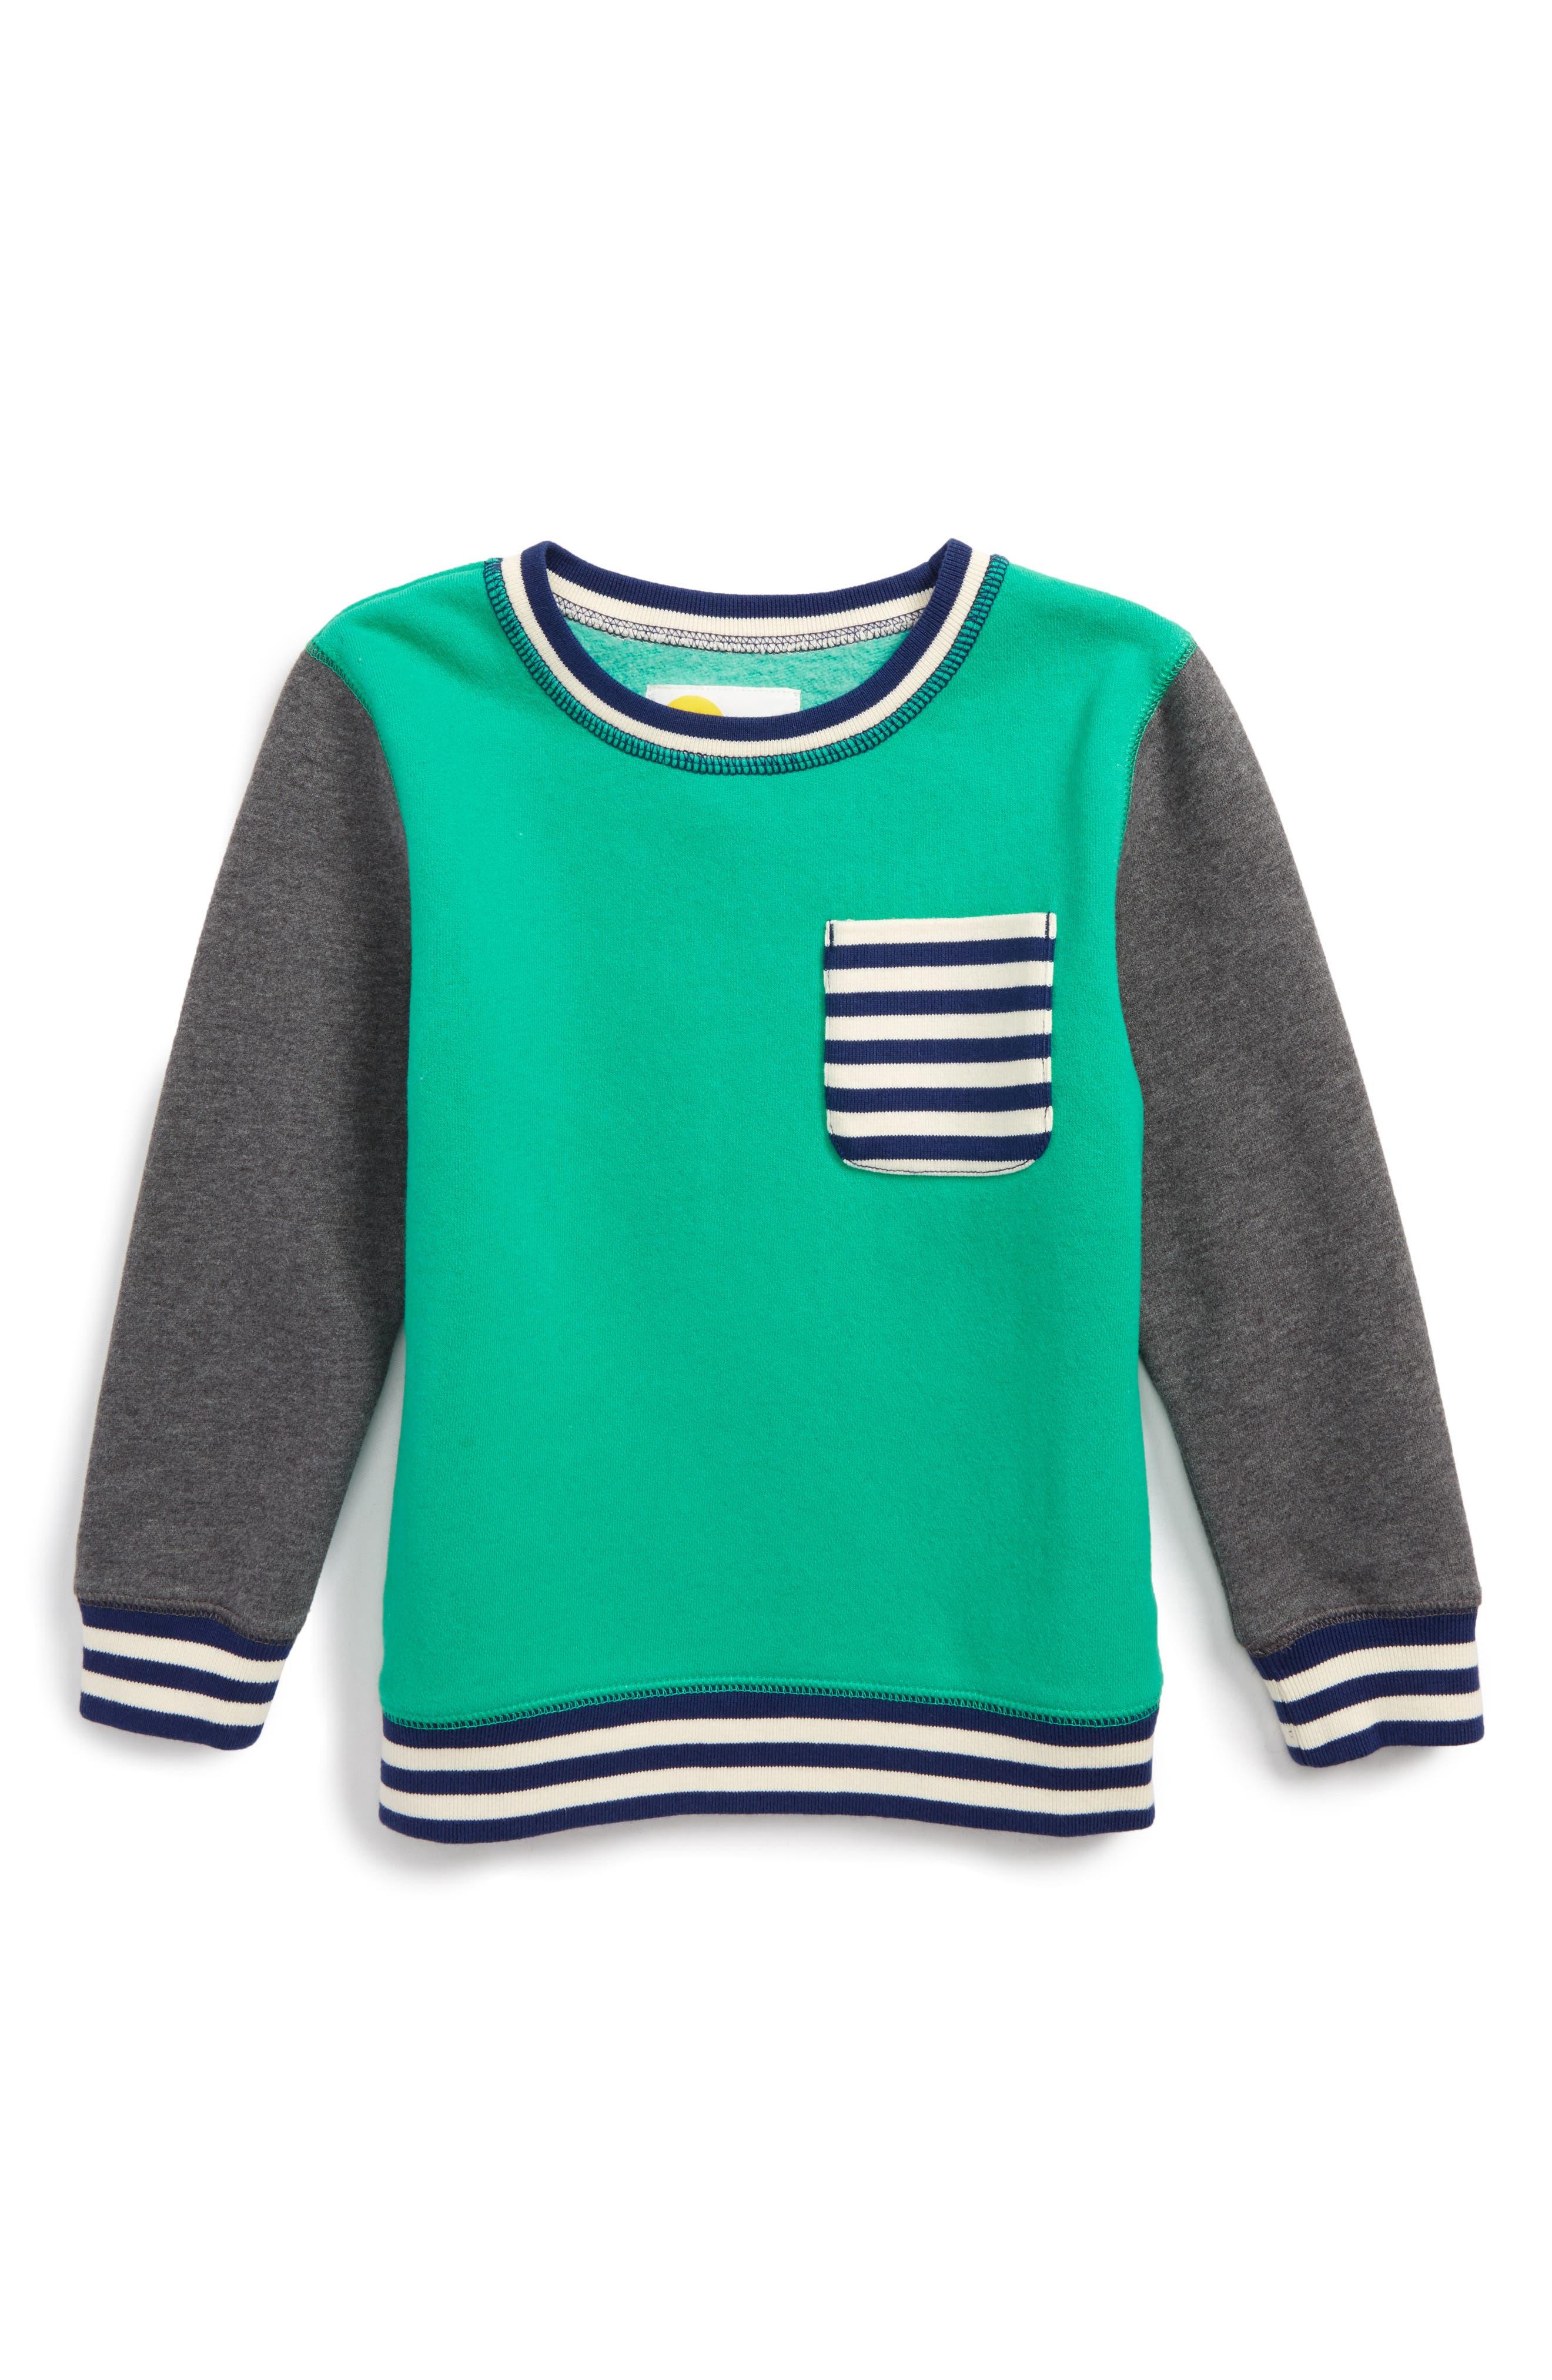 Alternate Image 1 Selected - Mini Boden Fun Sweatshirt (Toddler Boys, Little Boys & Big Boys)